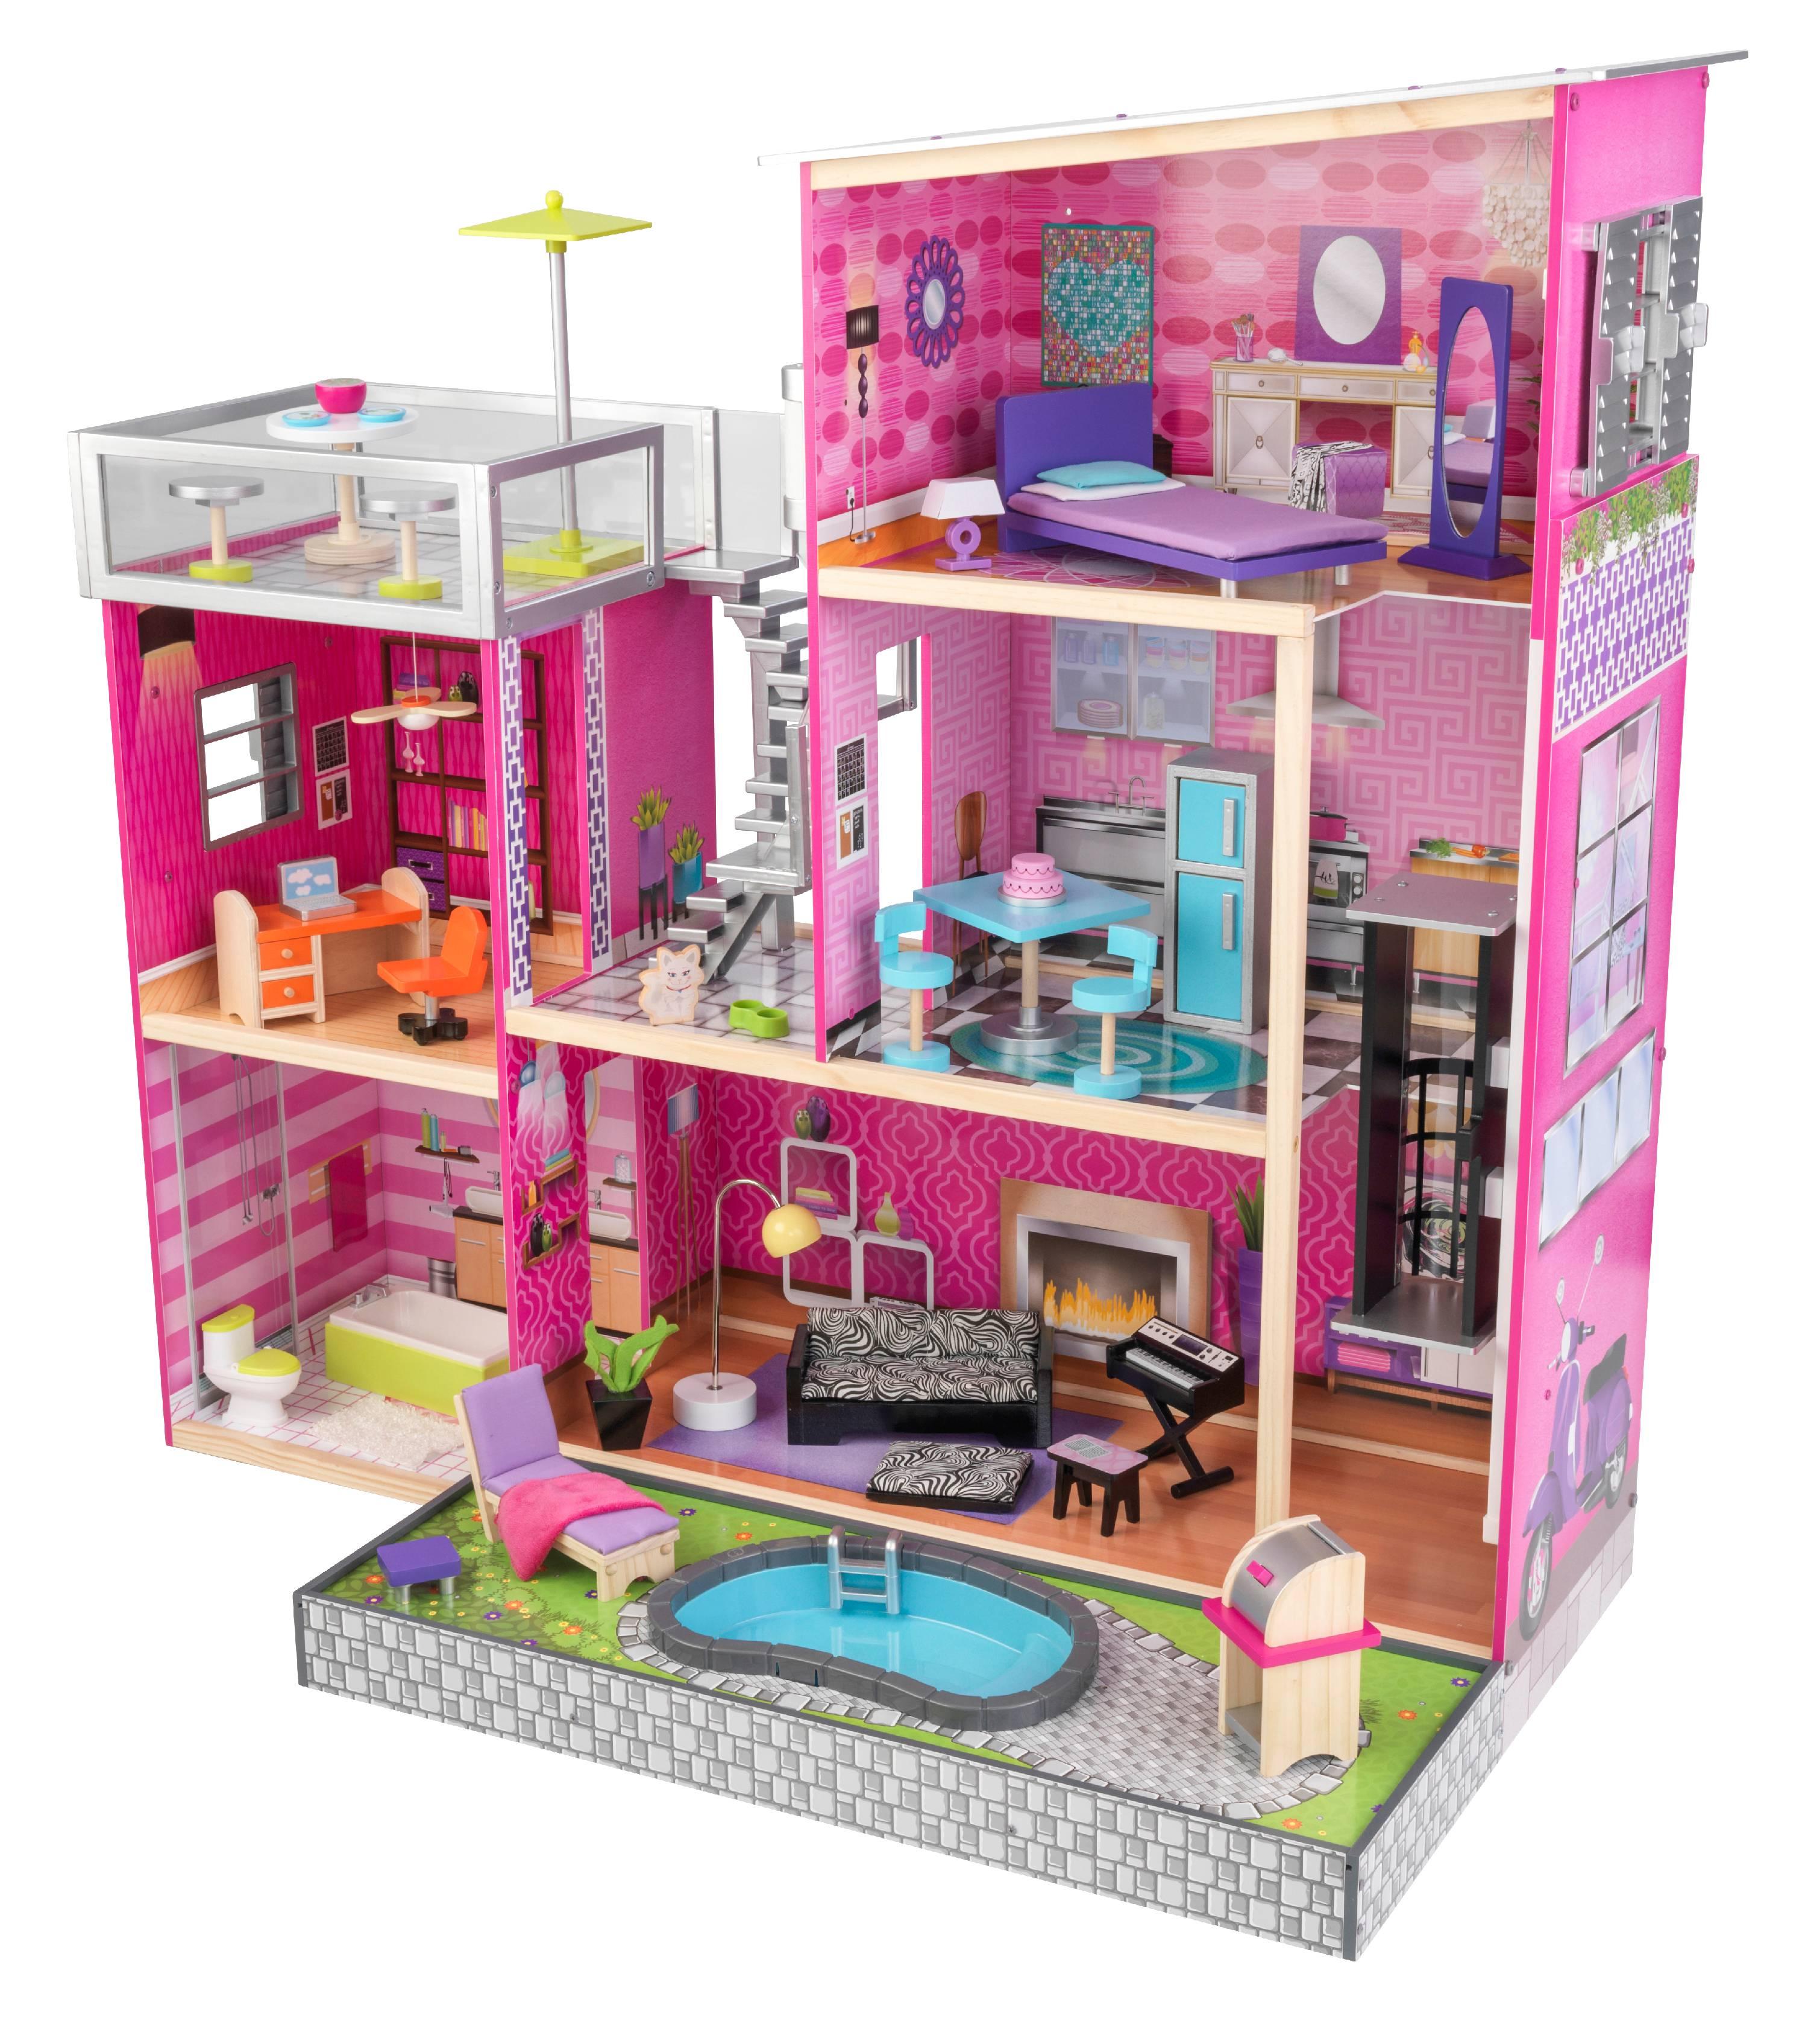 wooden barbie doll furniture. KidKraft Uptown Wooden Dollhouse With 35 Pieces Of Furniture Barbie Doll